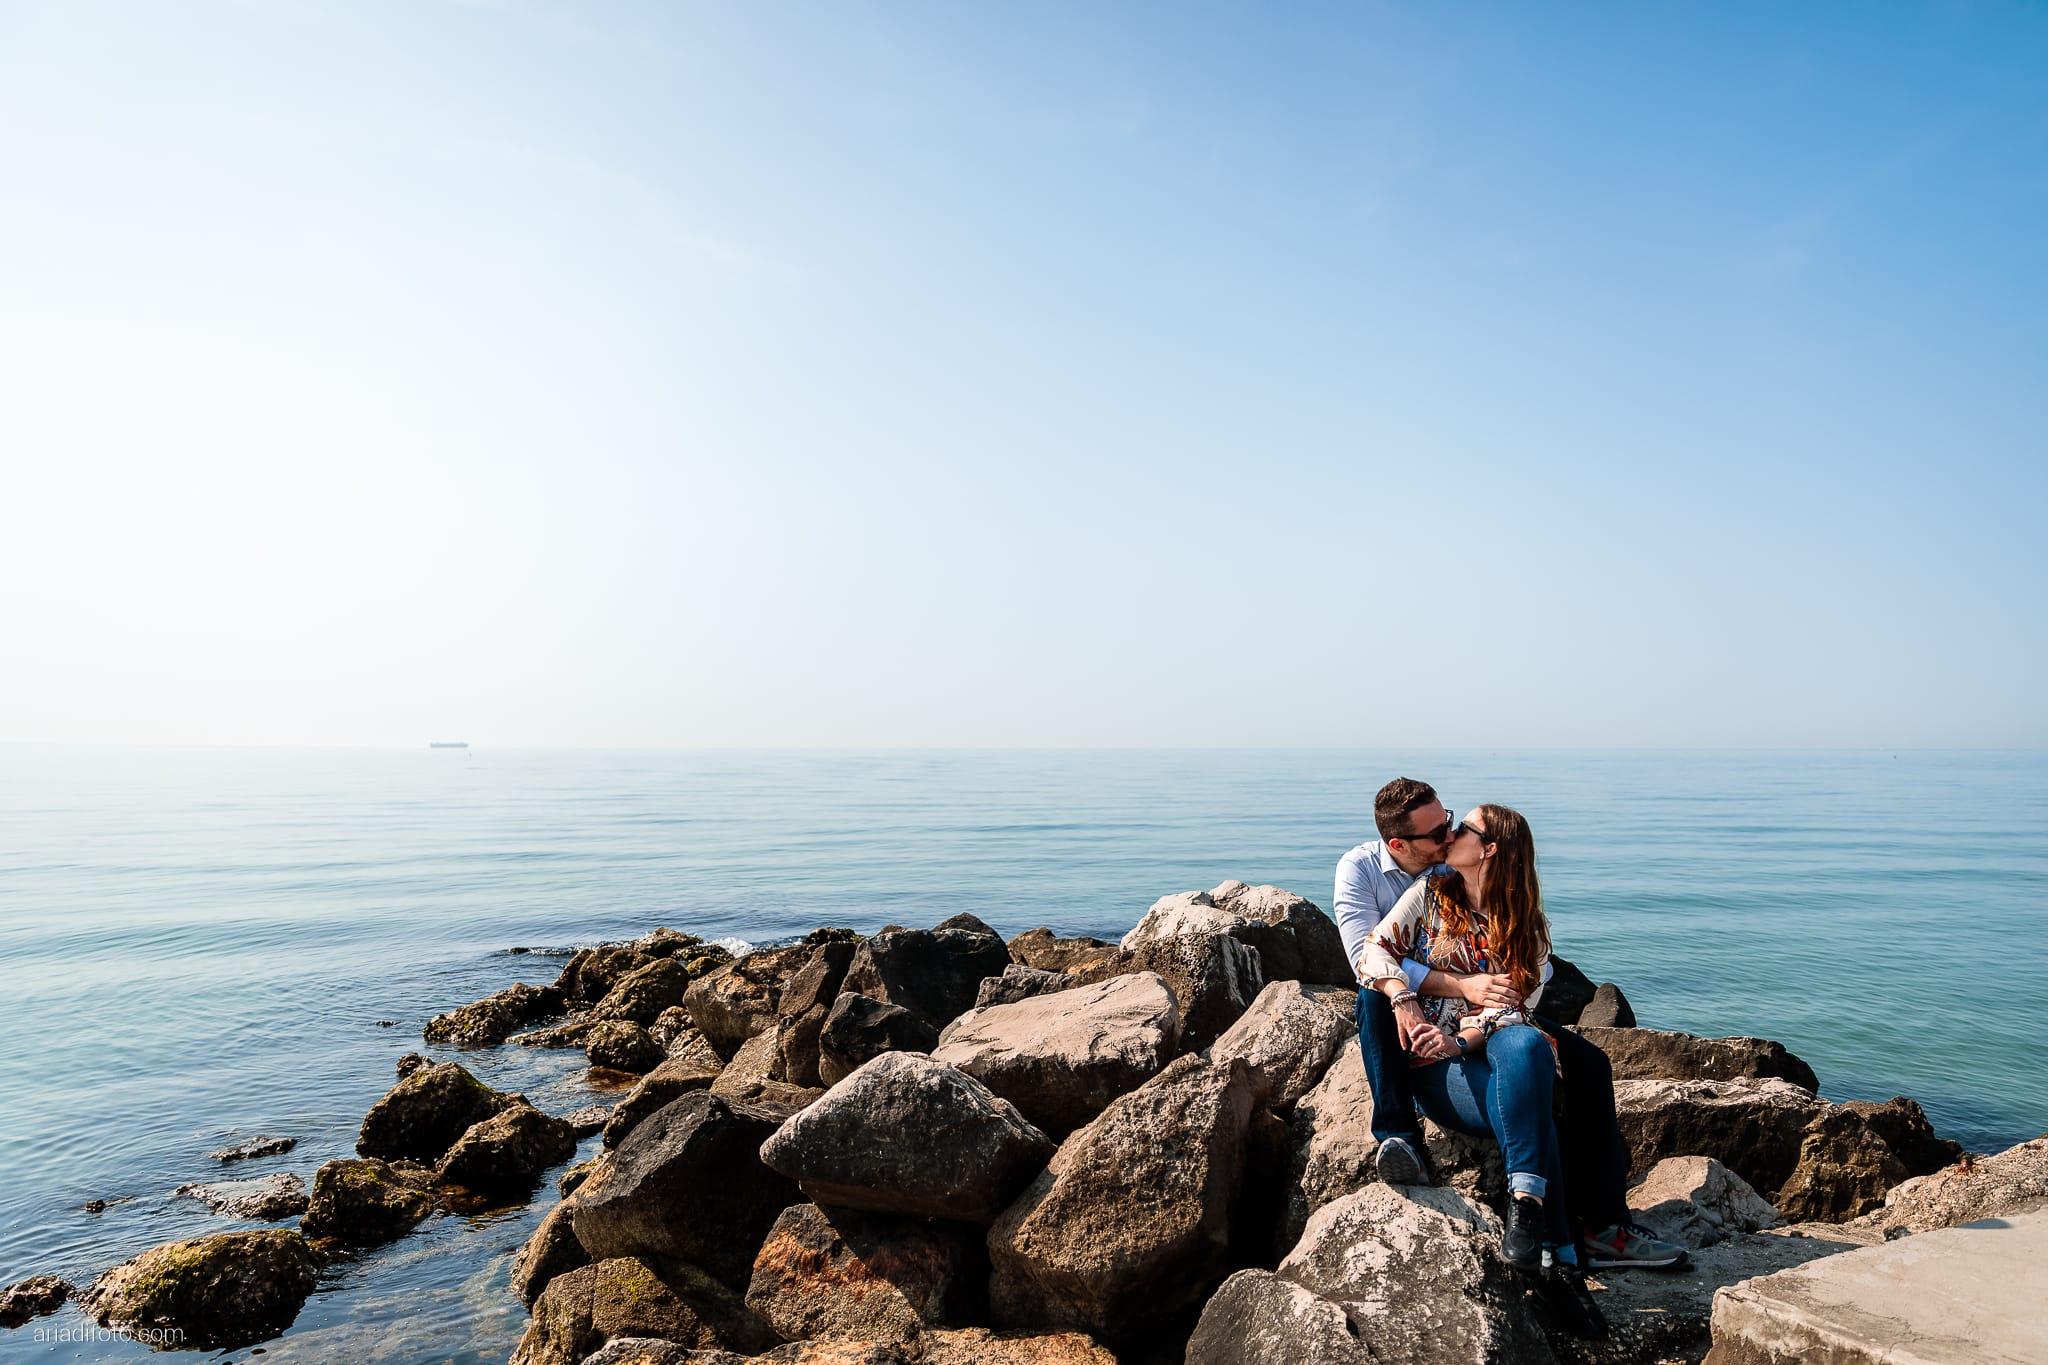 Anna Matteo Prematrimoniale Spiaggia Diga Cittavecchia Grado Udine